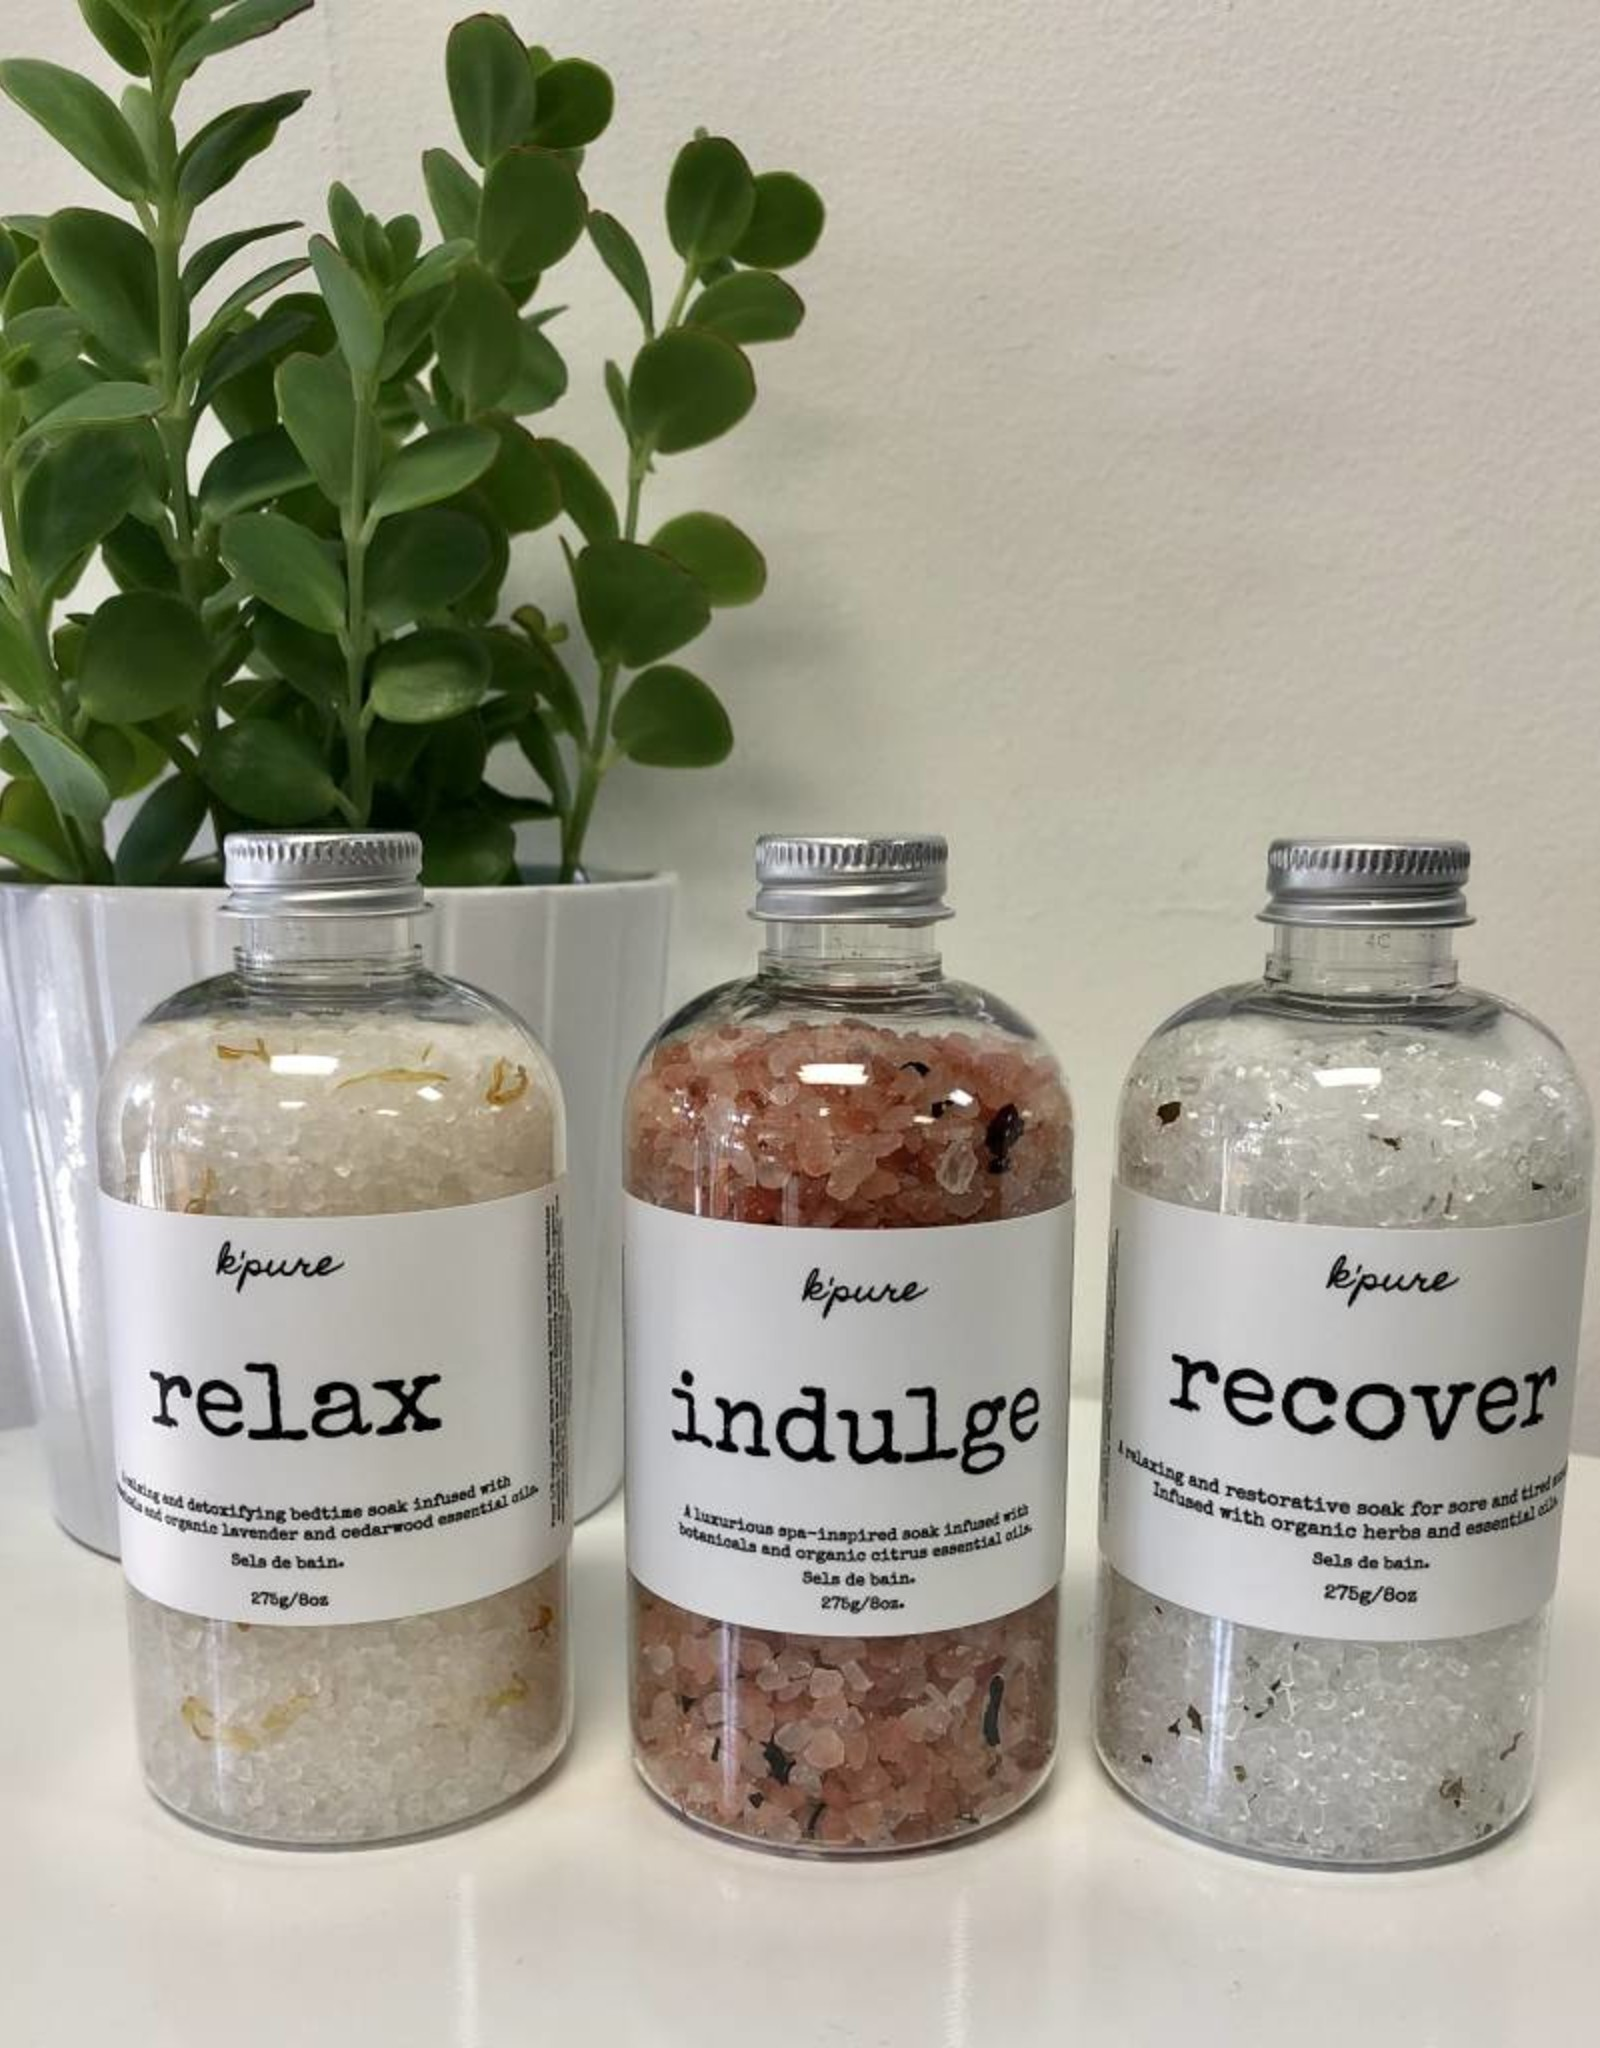 K'PURE RELAX bath salt, 8oz